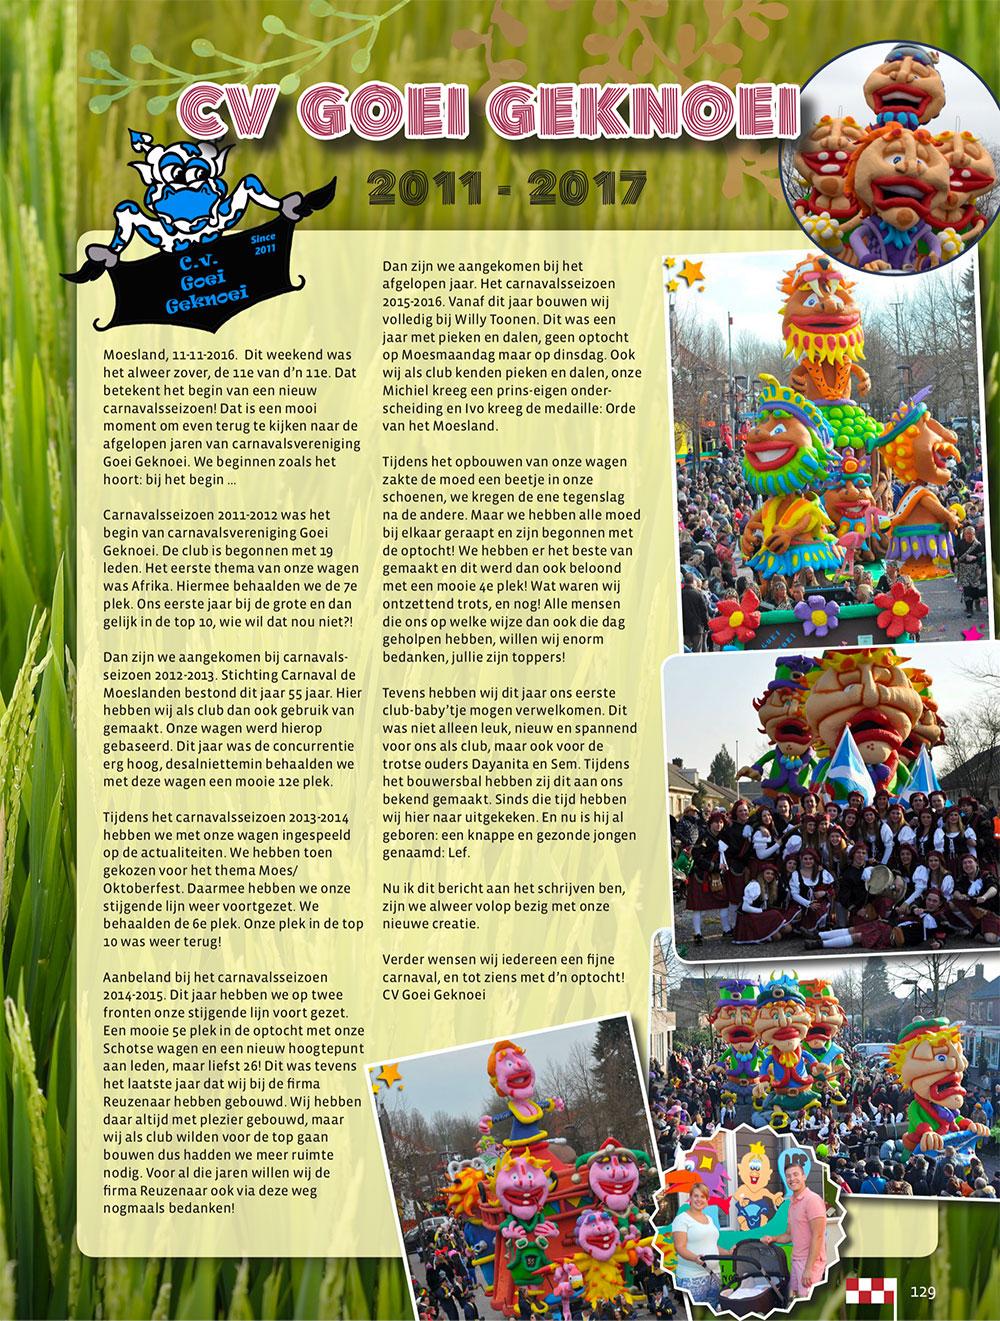 Stukje uit de carnavalskrant van Goei Geknoei - 2017